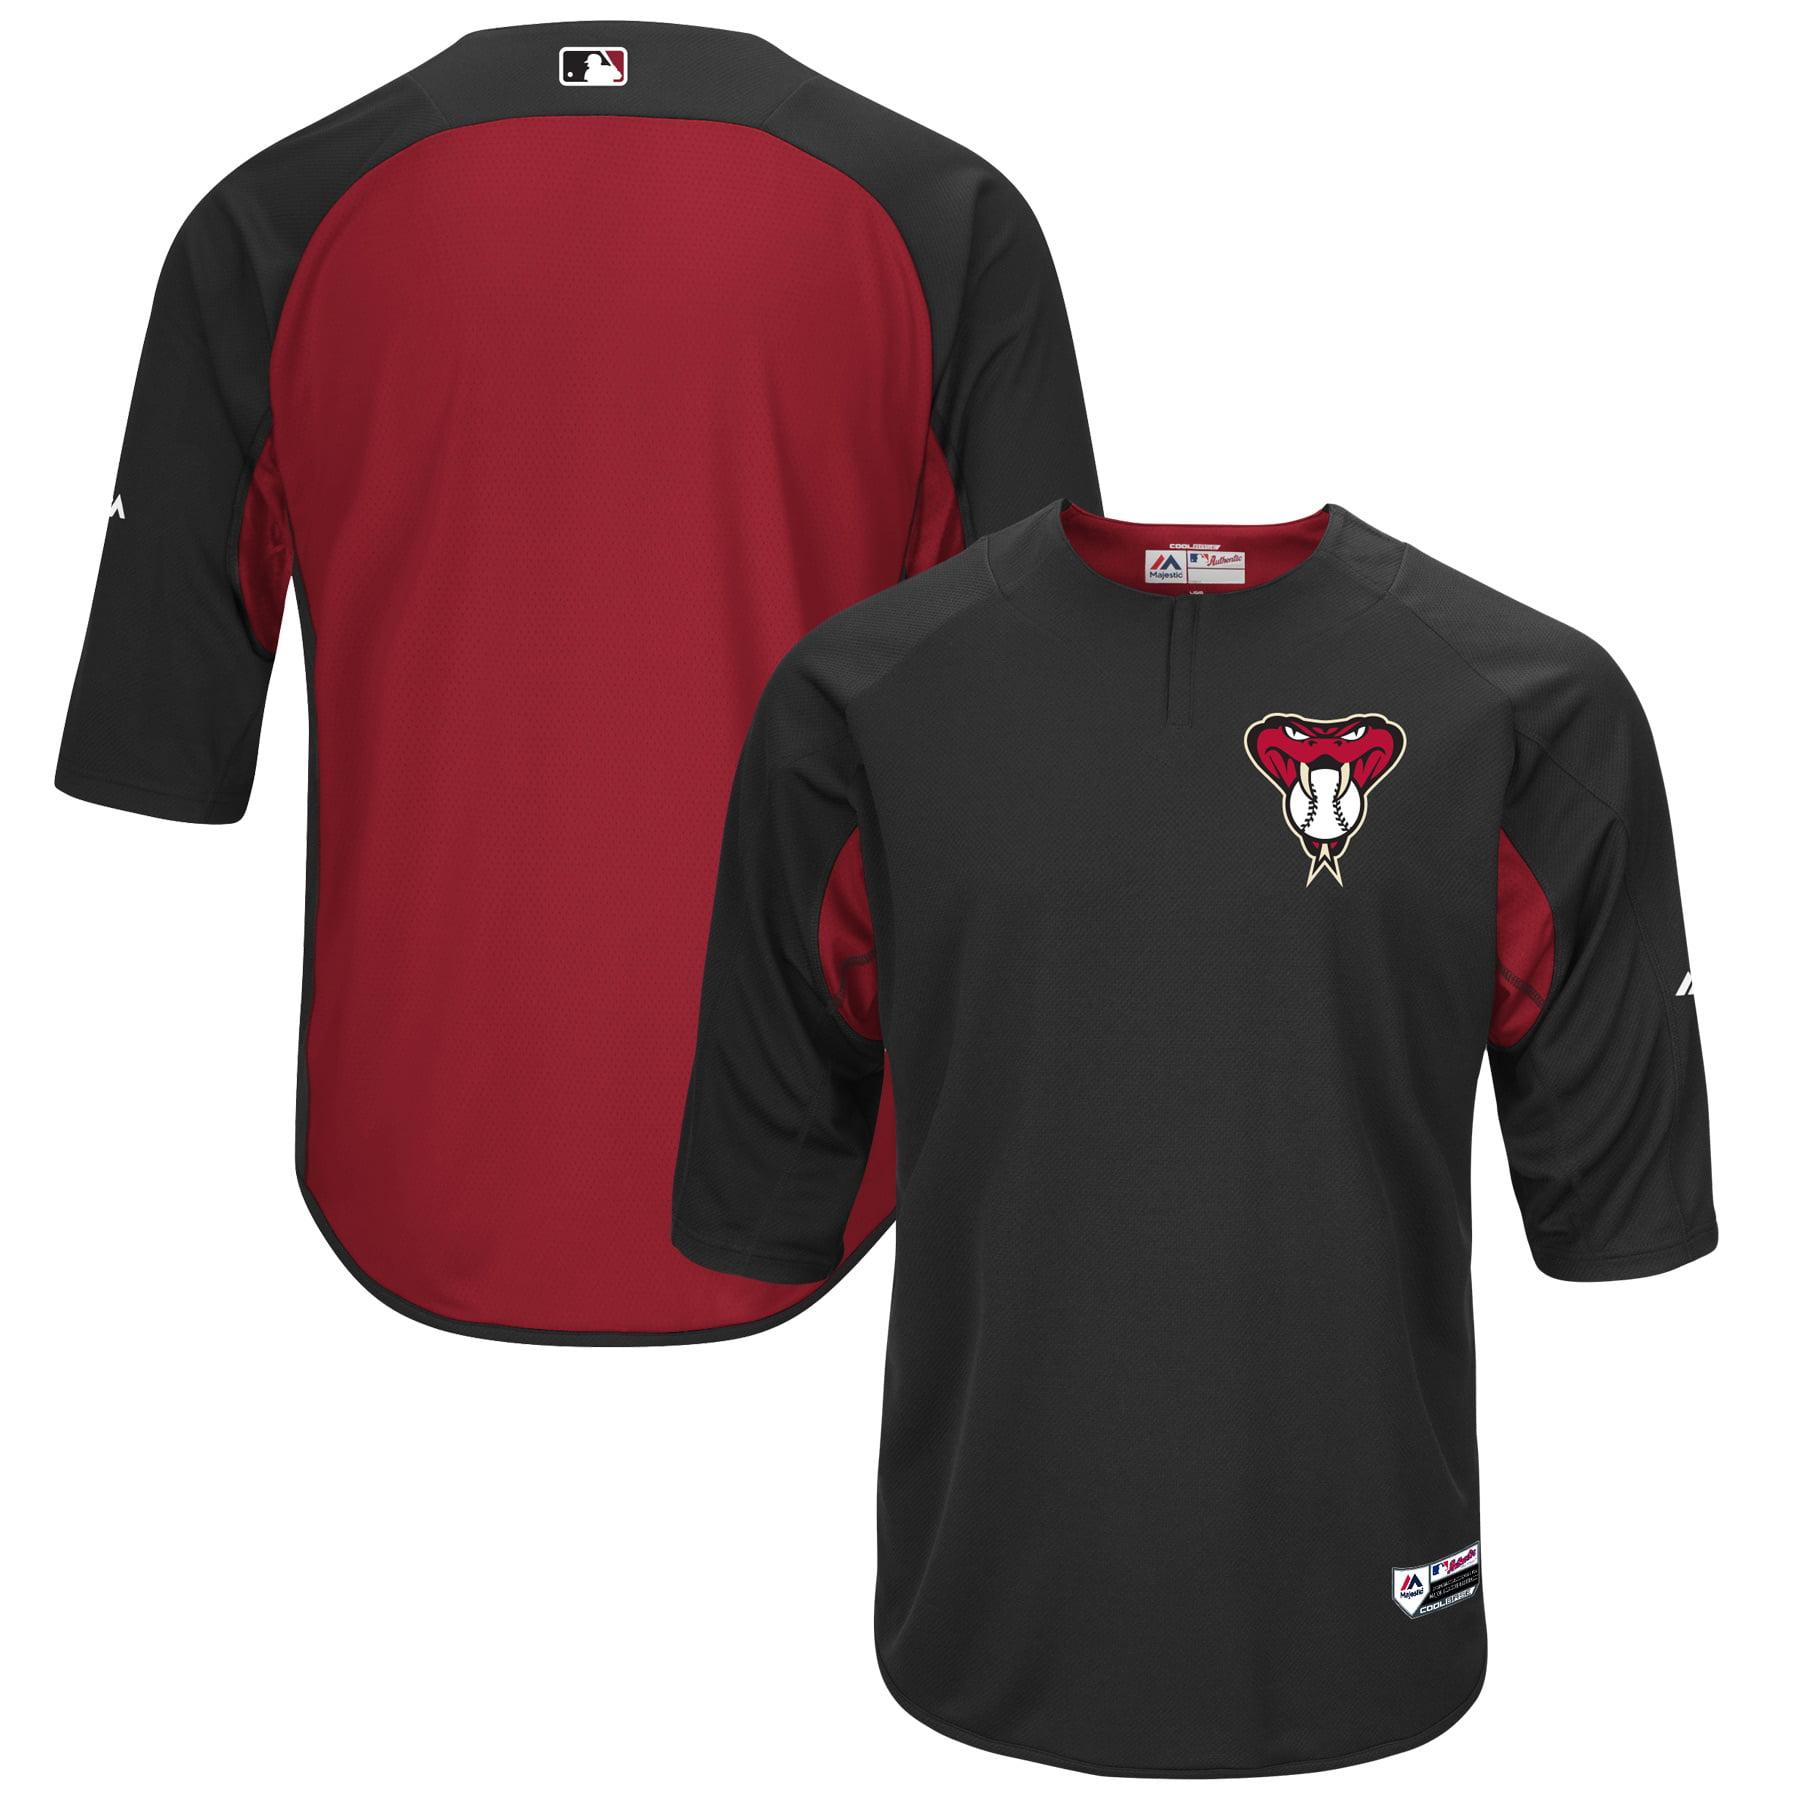 Arizona Diamondbacks Majestic Authentic Collection On-Field 3/4-Sleeve Batting Practice Jersey - Black/Sedona Red